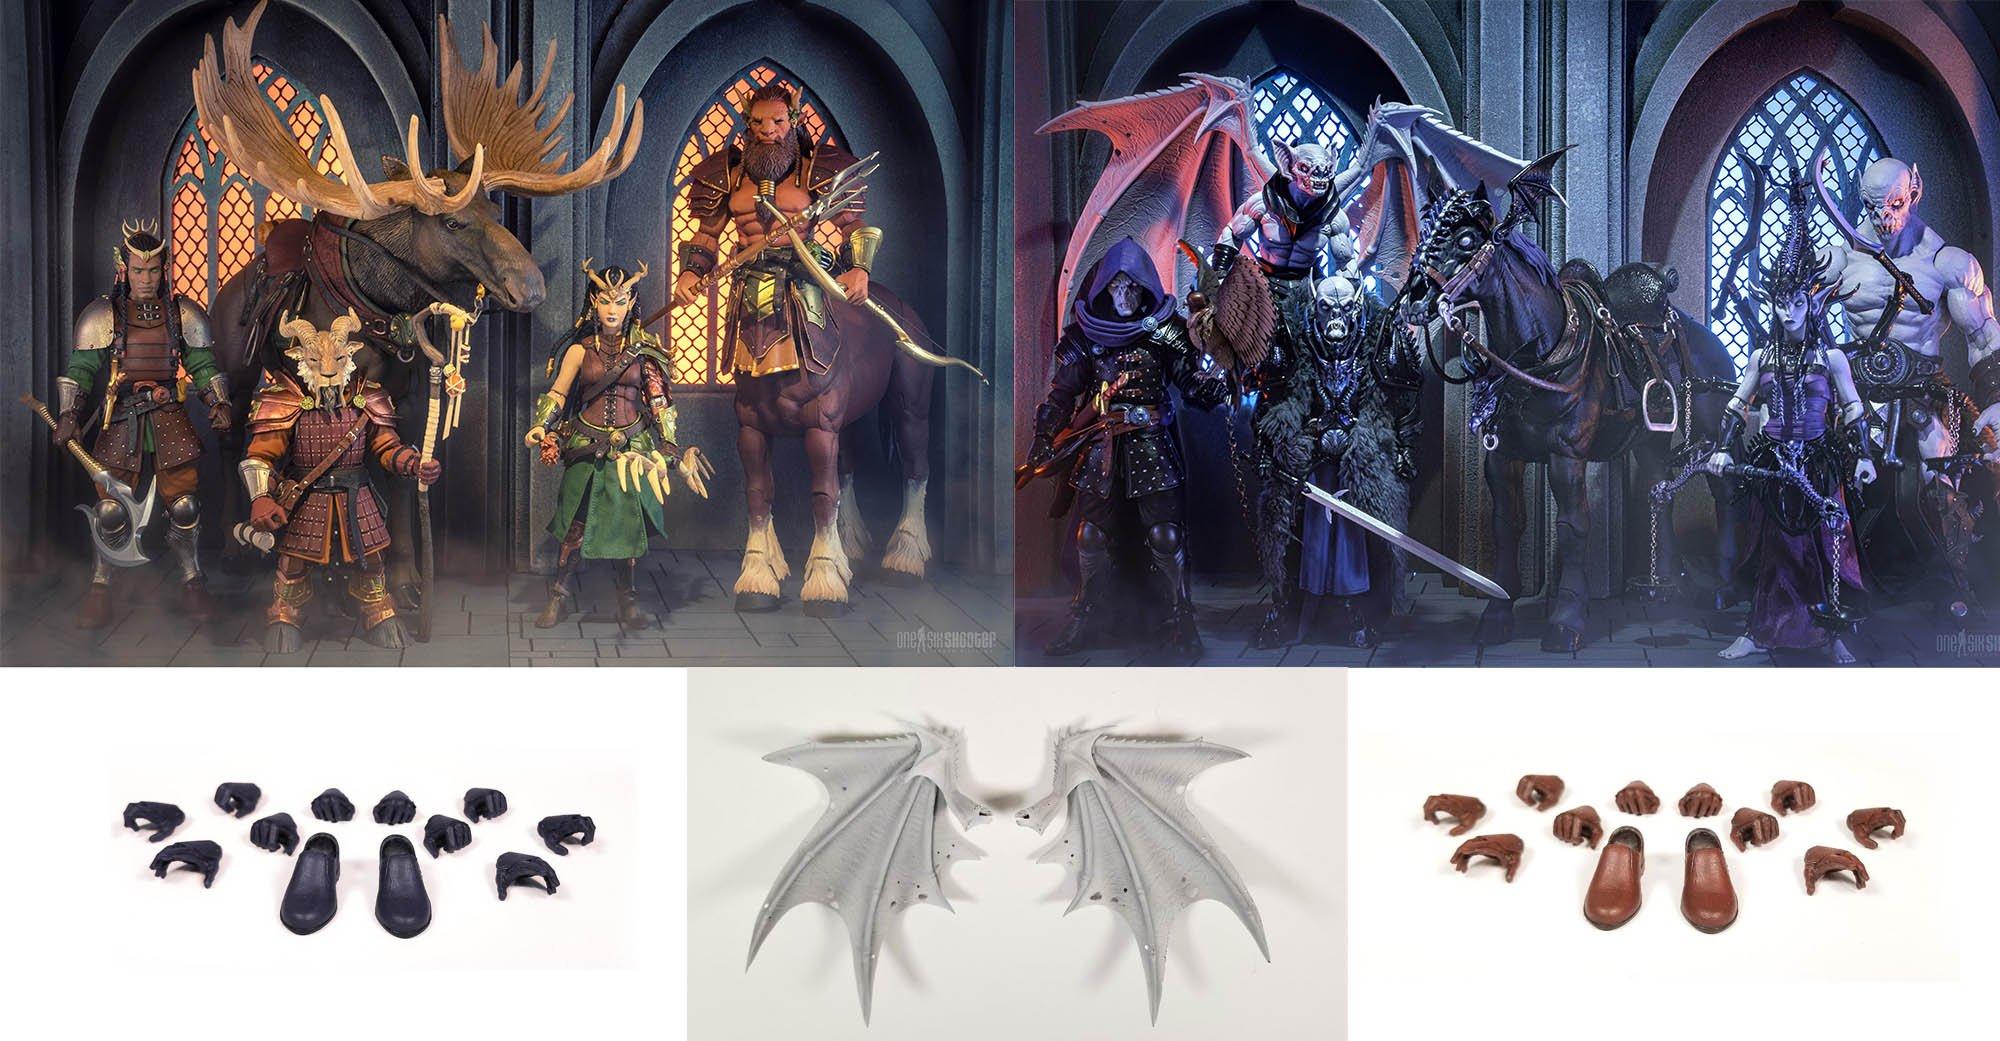 Four Horsemen Studios – Mythic Legions: Illythia Pre-Order Ends January 8th, 2021